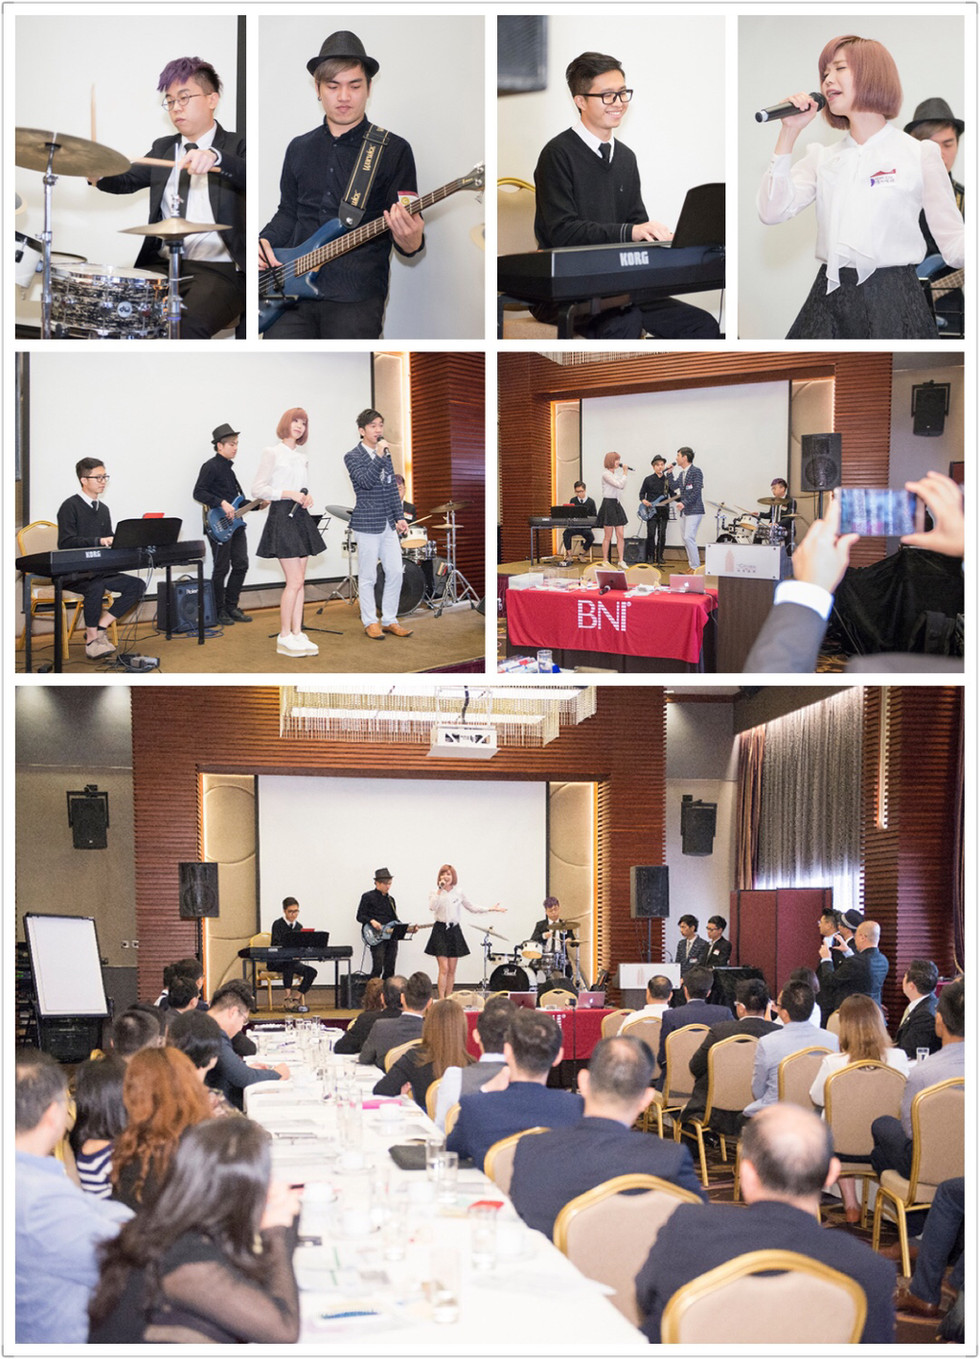 Live Band Performance 現場樂隊表演 (4 pieces band) - BNI live music performance